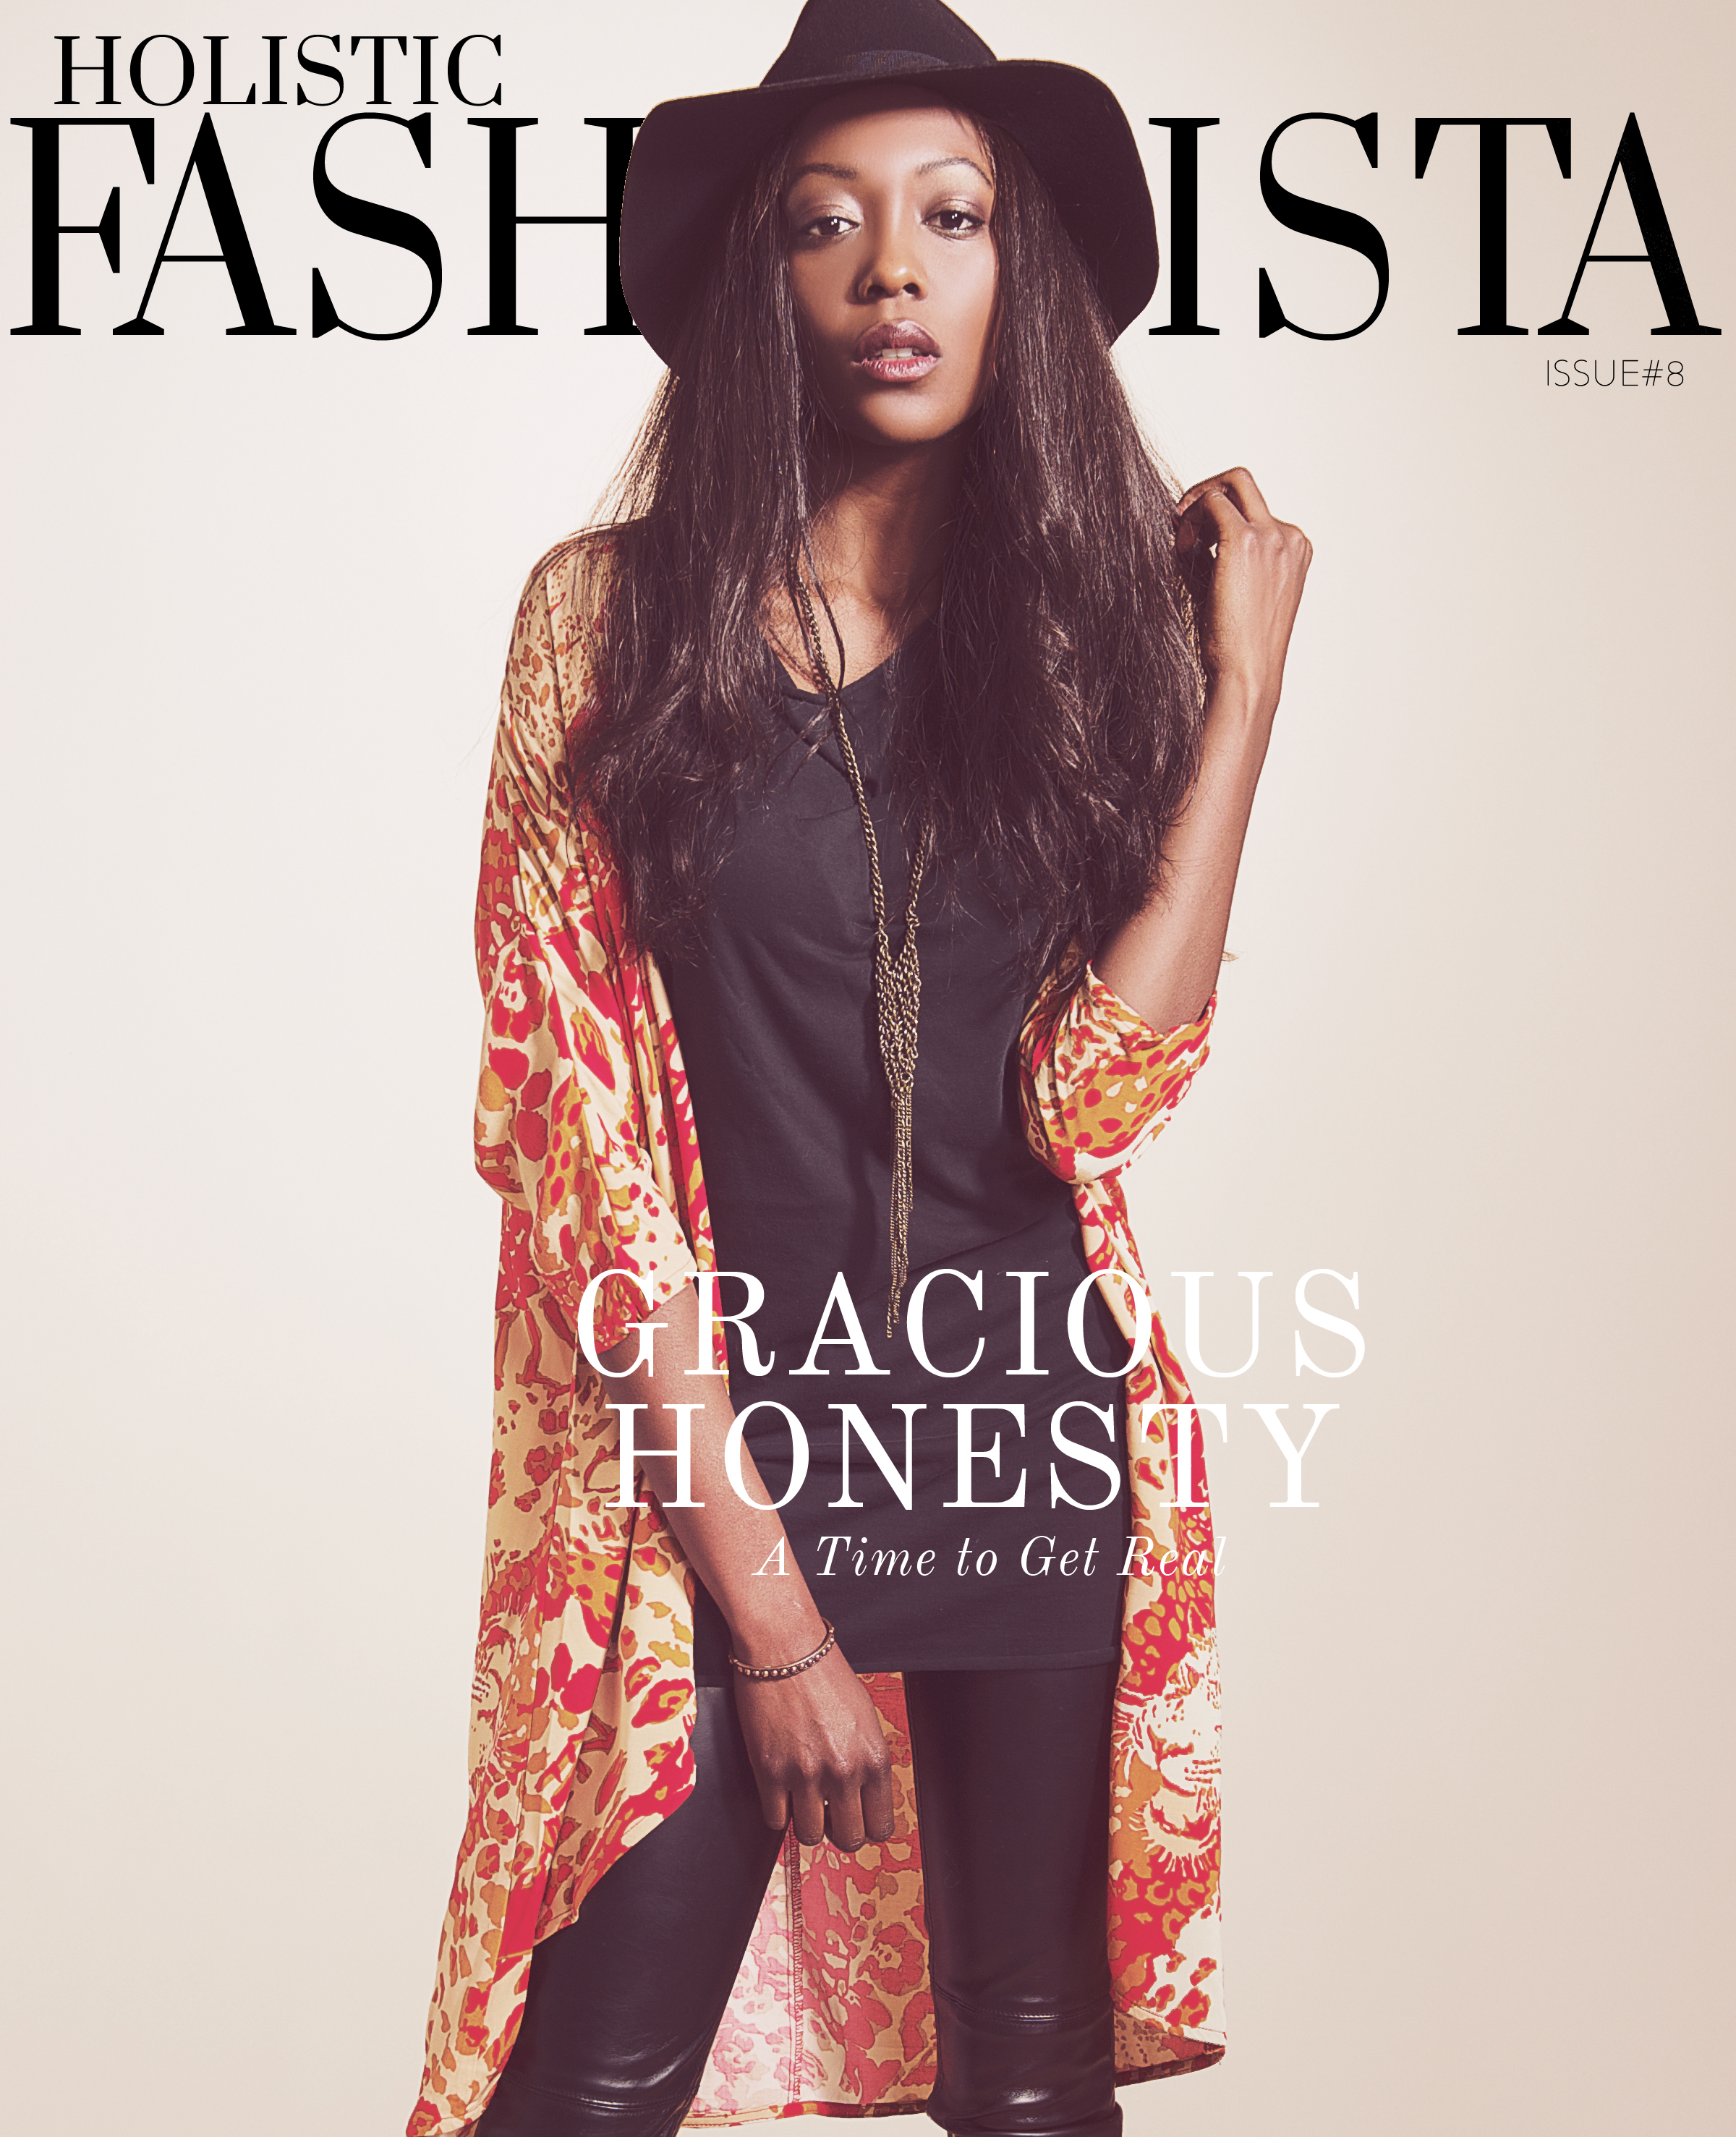 Holistic Fashionista Magazine: Issue #8